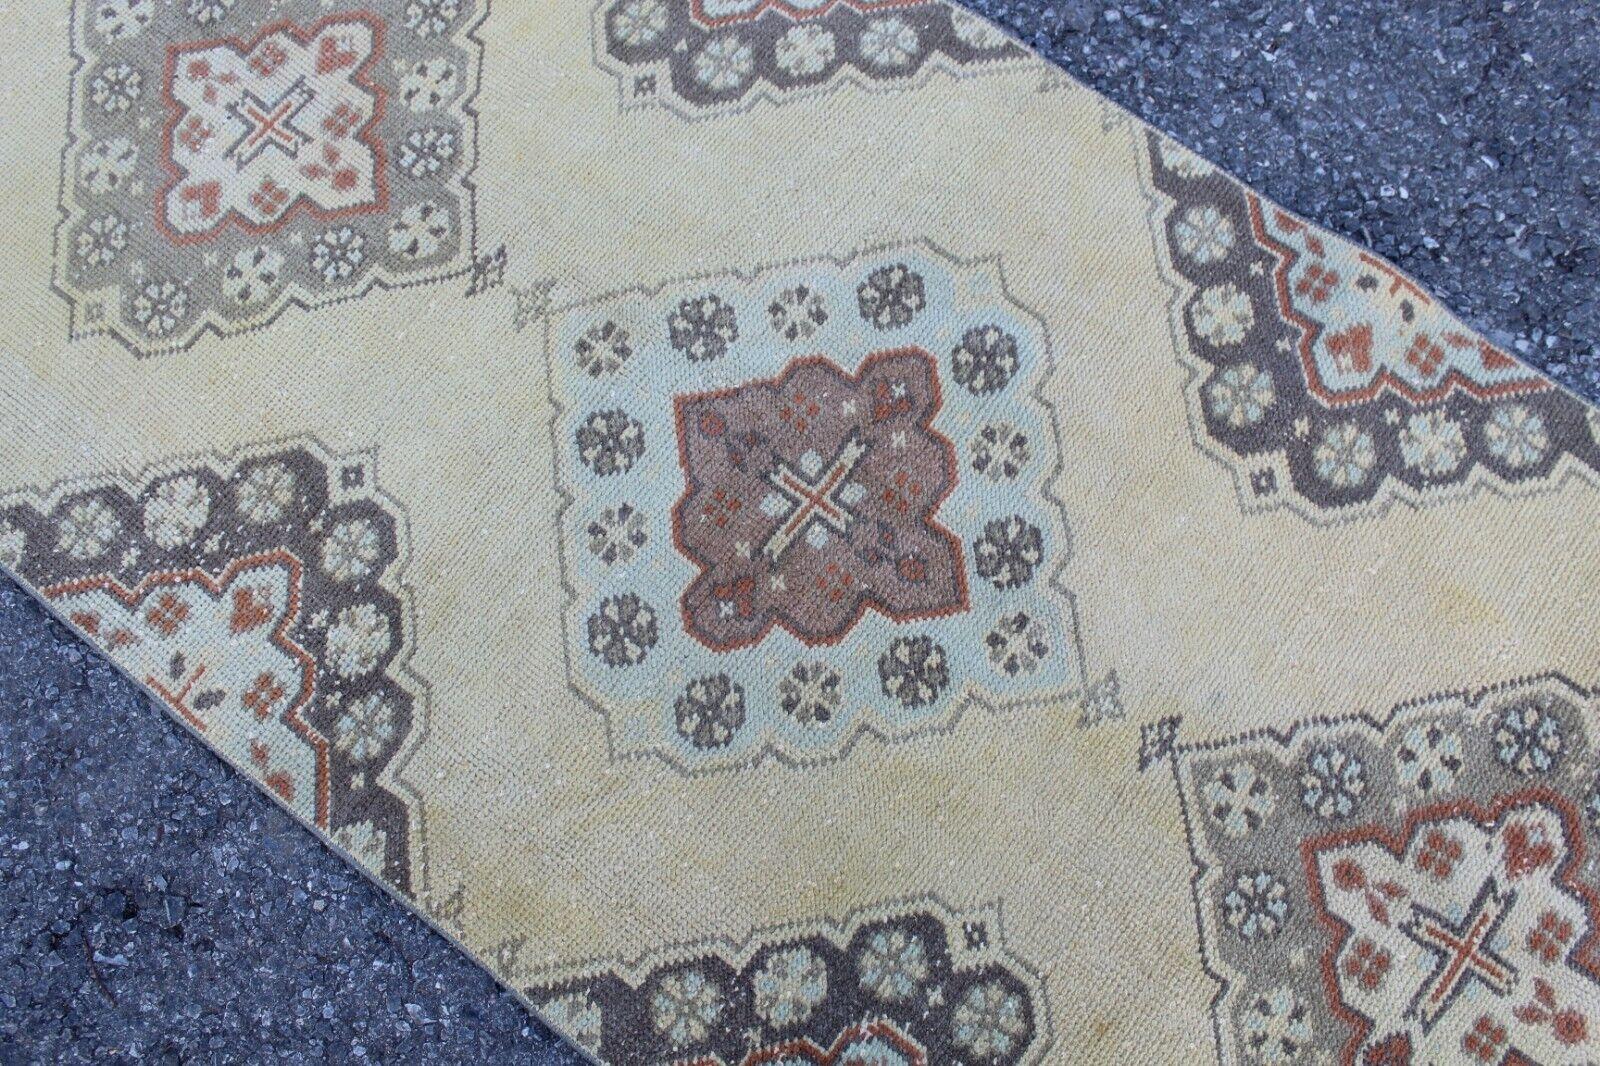 Vintage Handmade Turkish Kitchen Oushak Runner Rug 10'4 10'4 10'4 x2'10  bdb58d